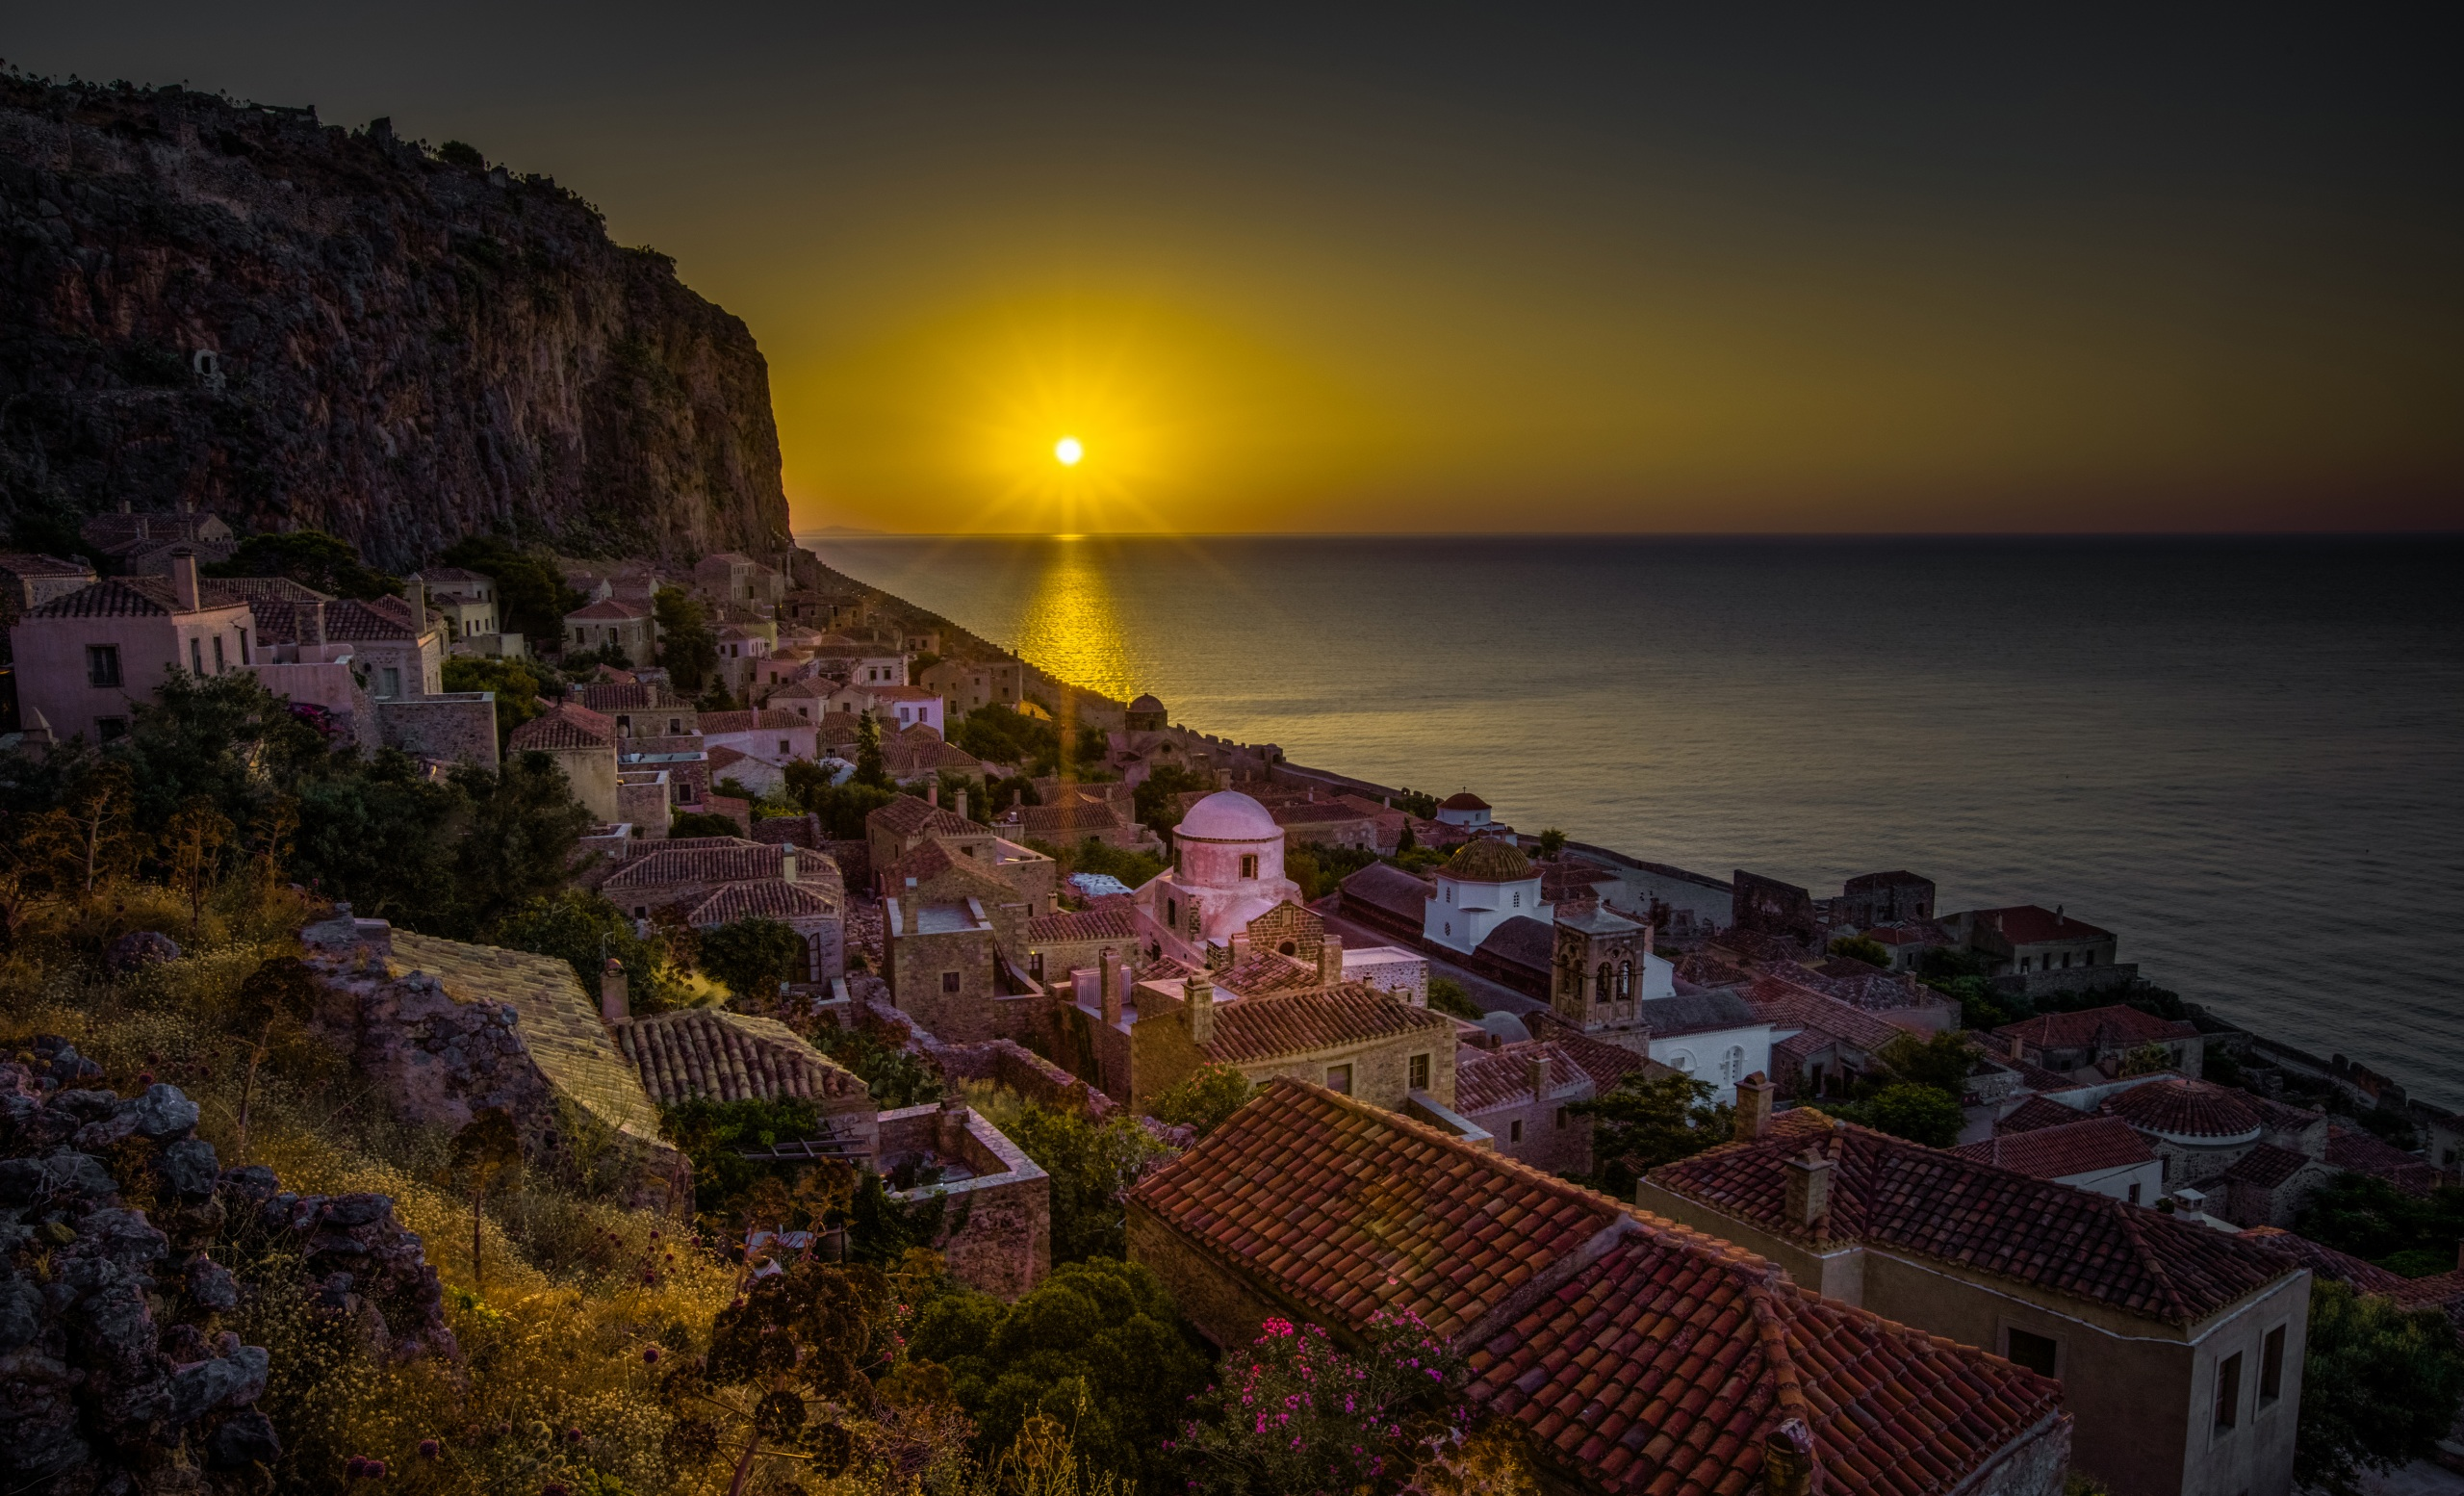 Photos Greece Monemvasia Sun Sea Roof Rock Sunrises and 2560x1554 2560x1554